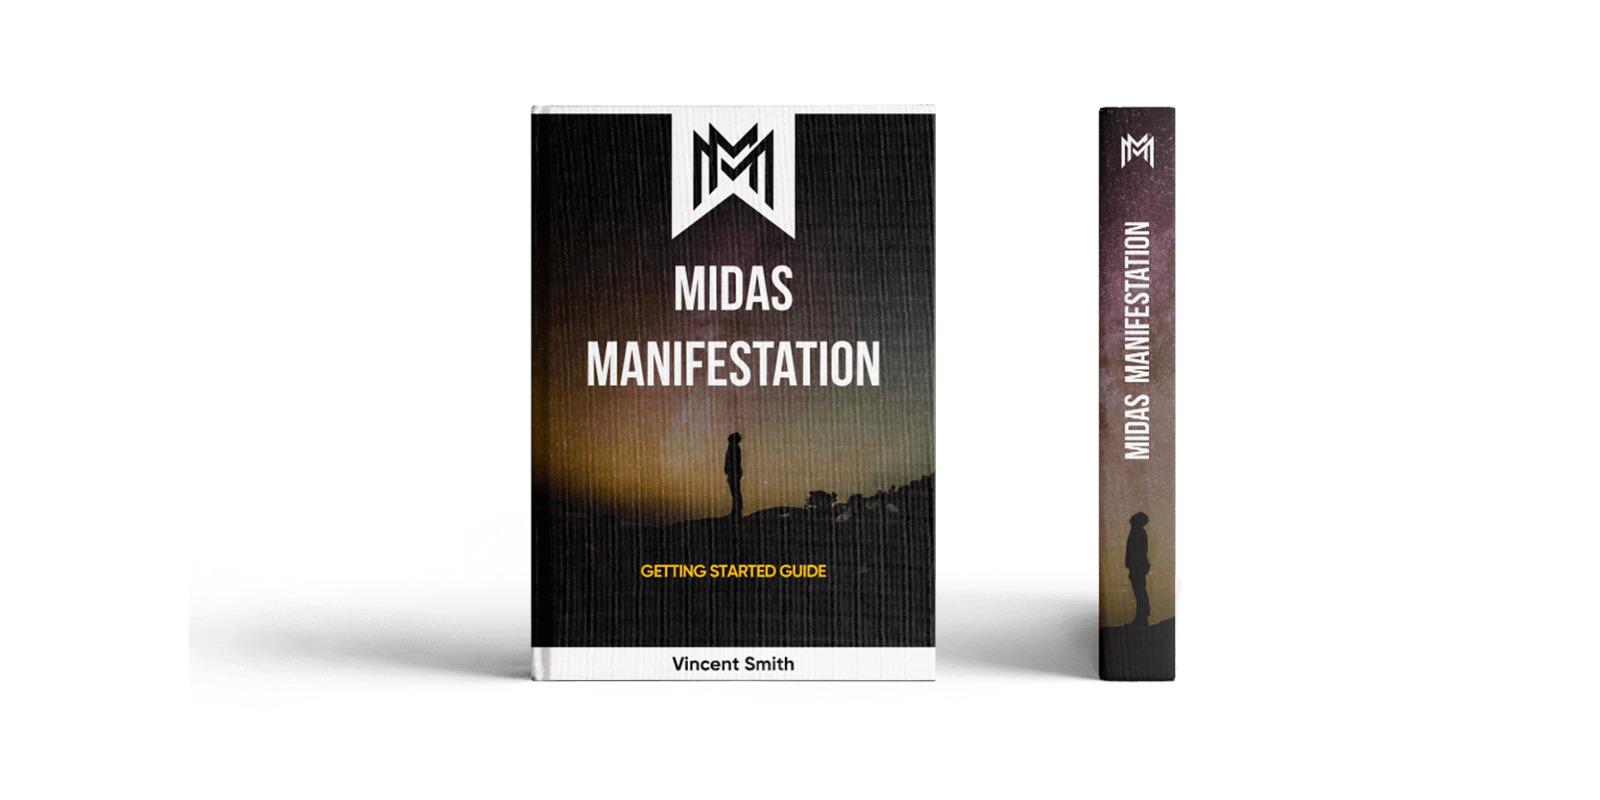 Midas manifestation guide